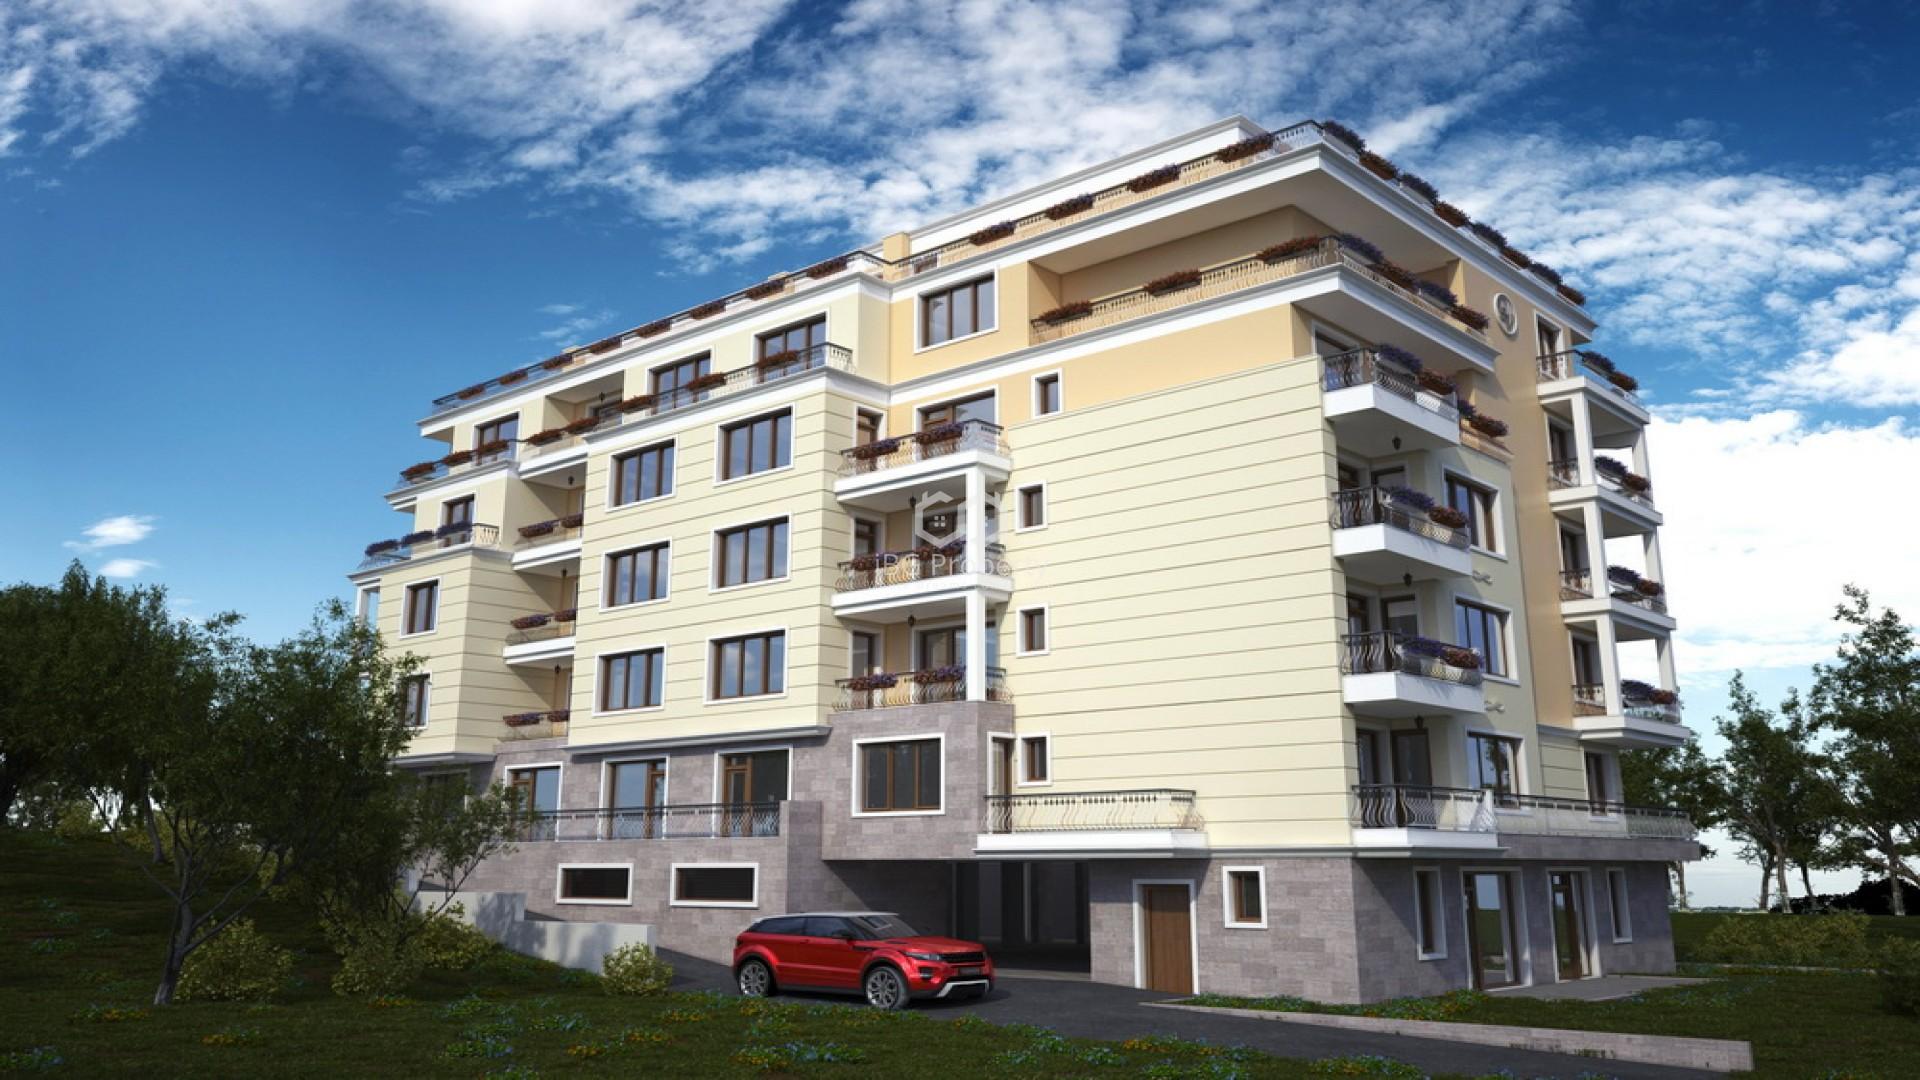 Двухкомнатная квартира Святой Влас 47 m2